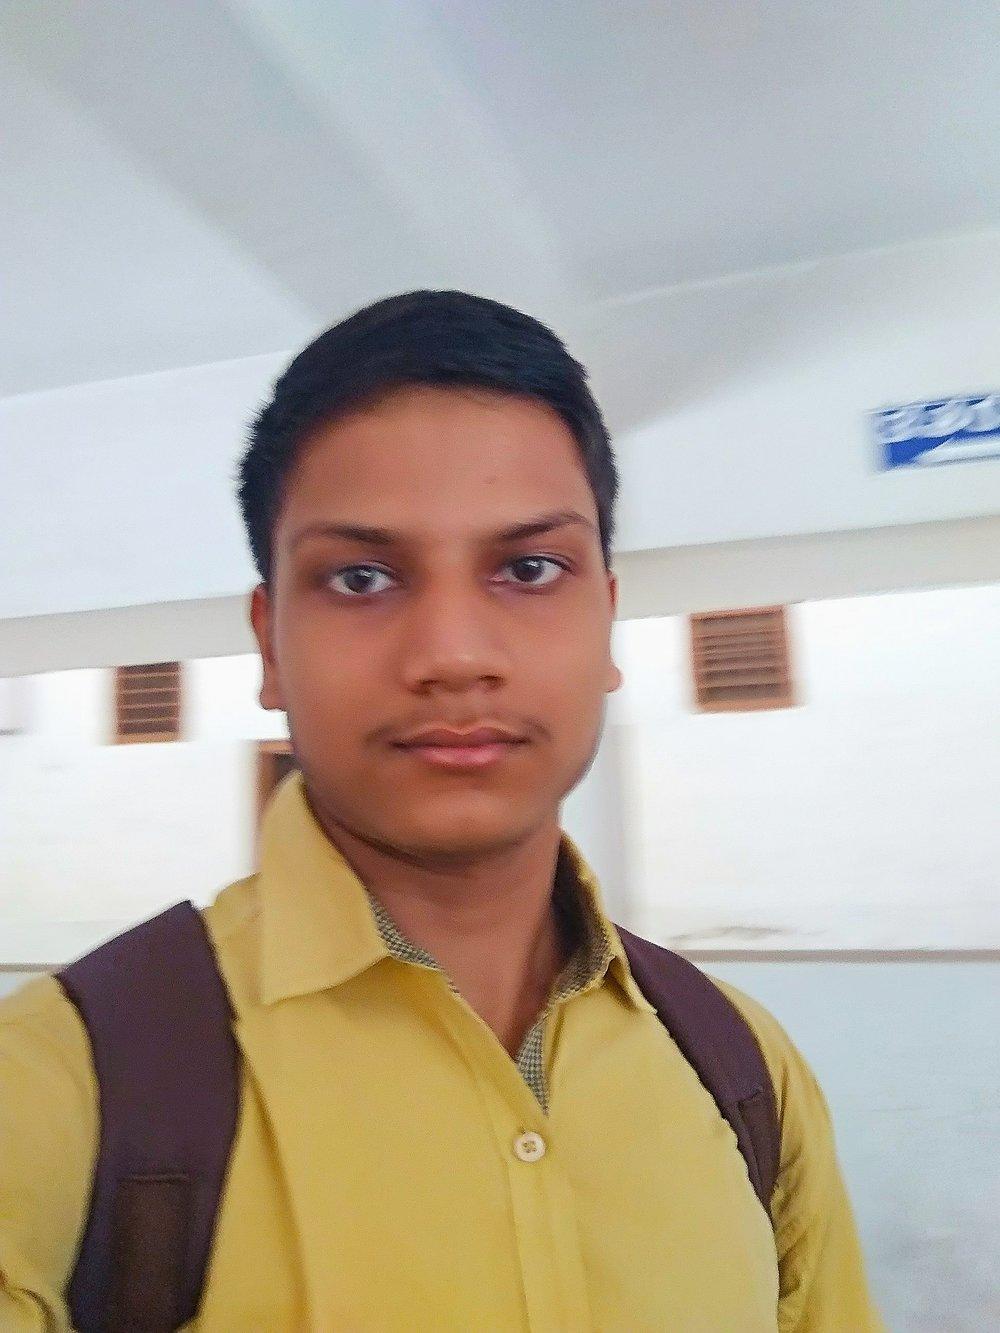 Shivansh Mishra, SVNIT Surat